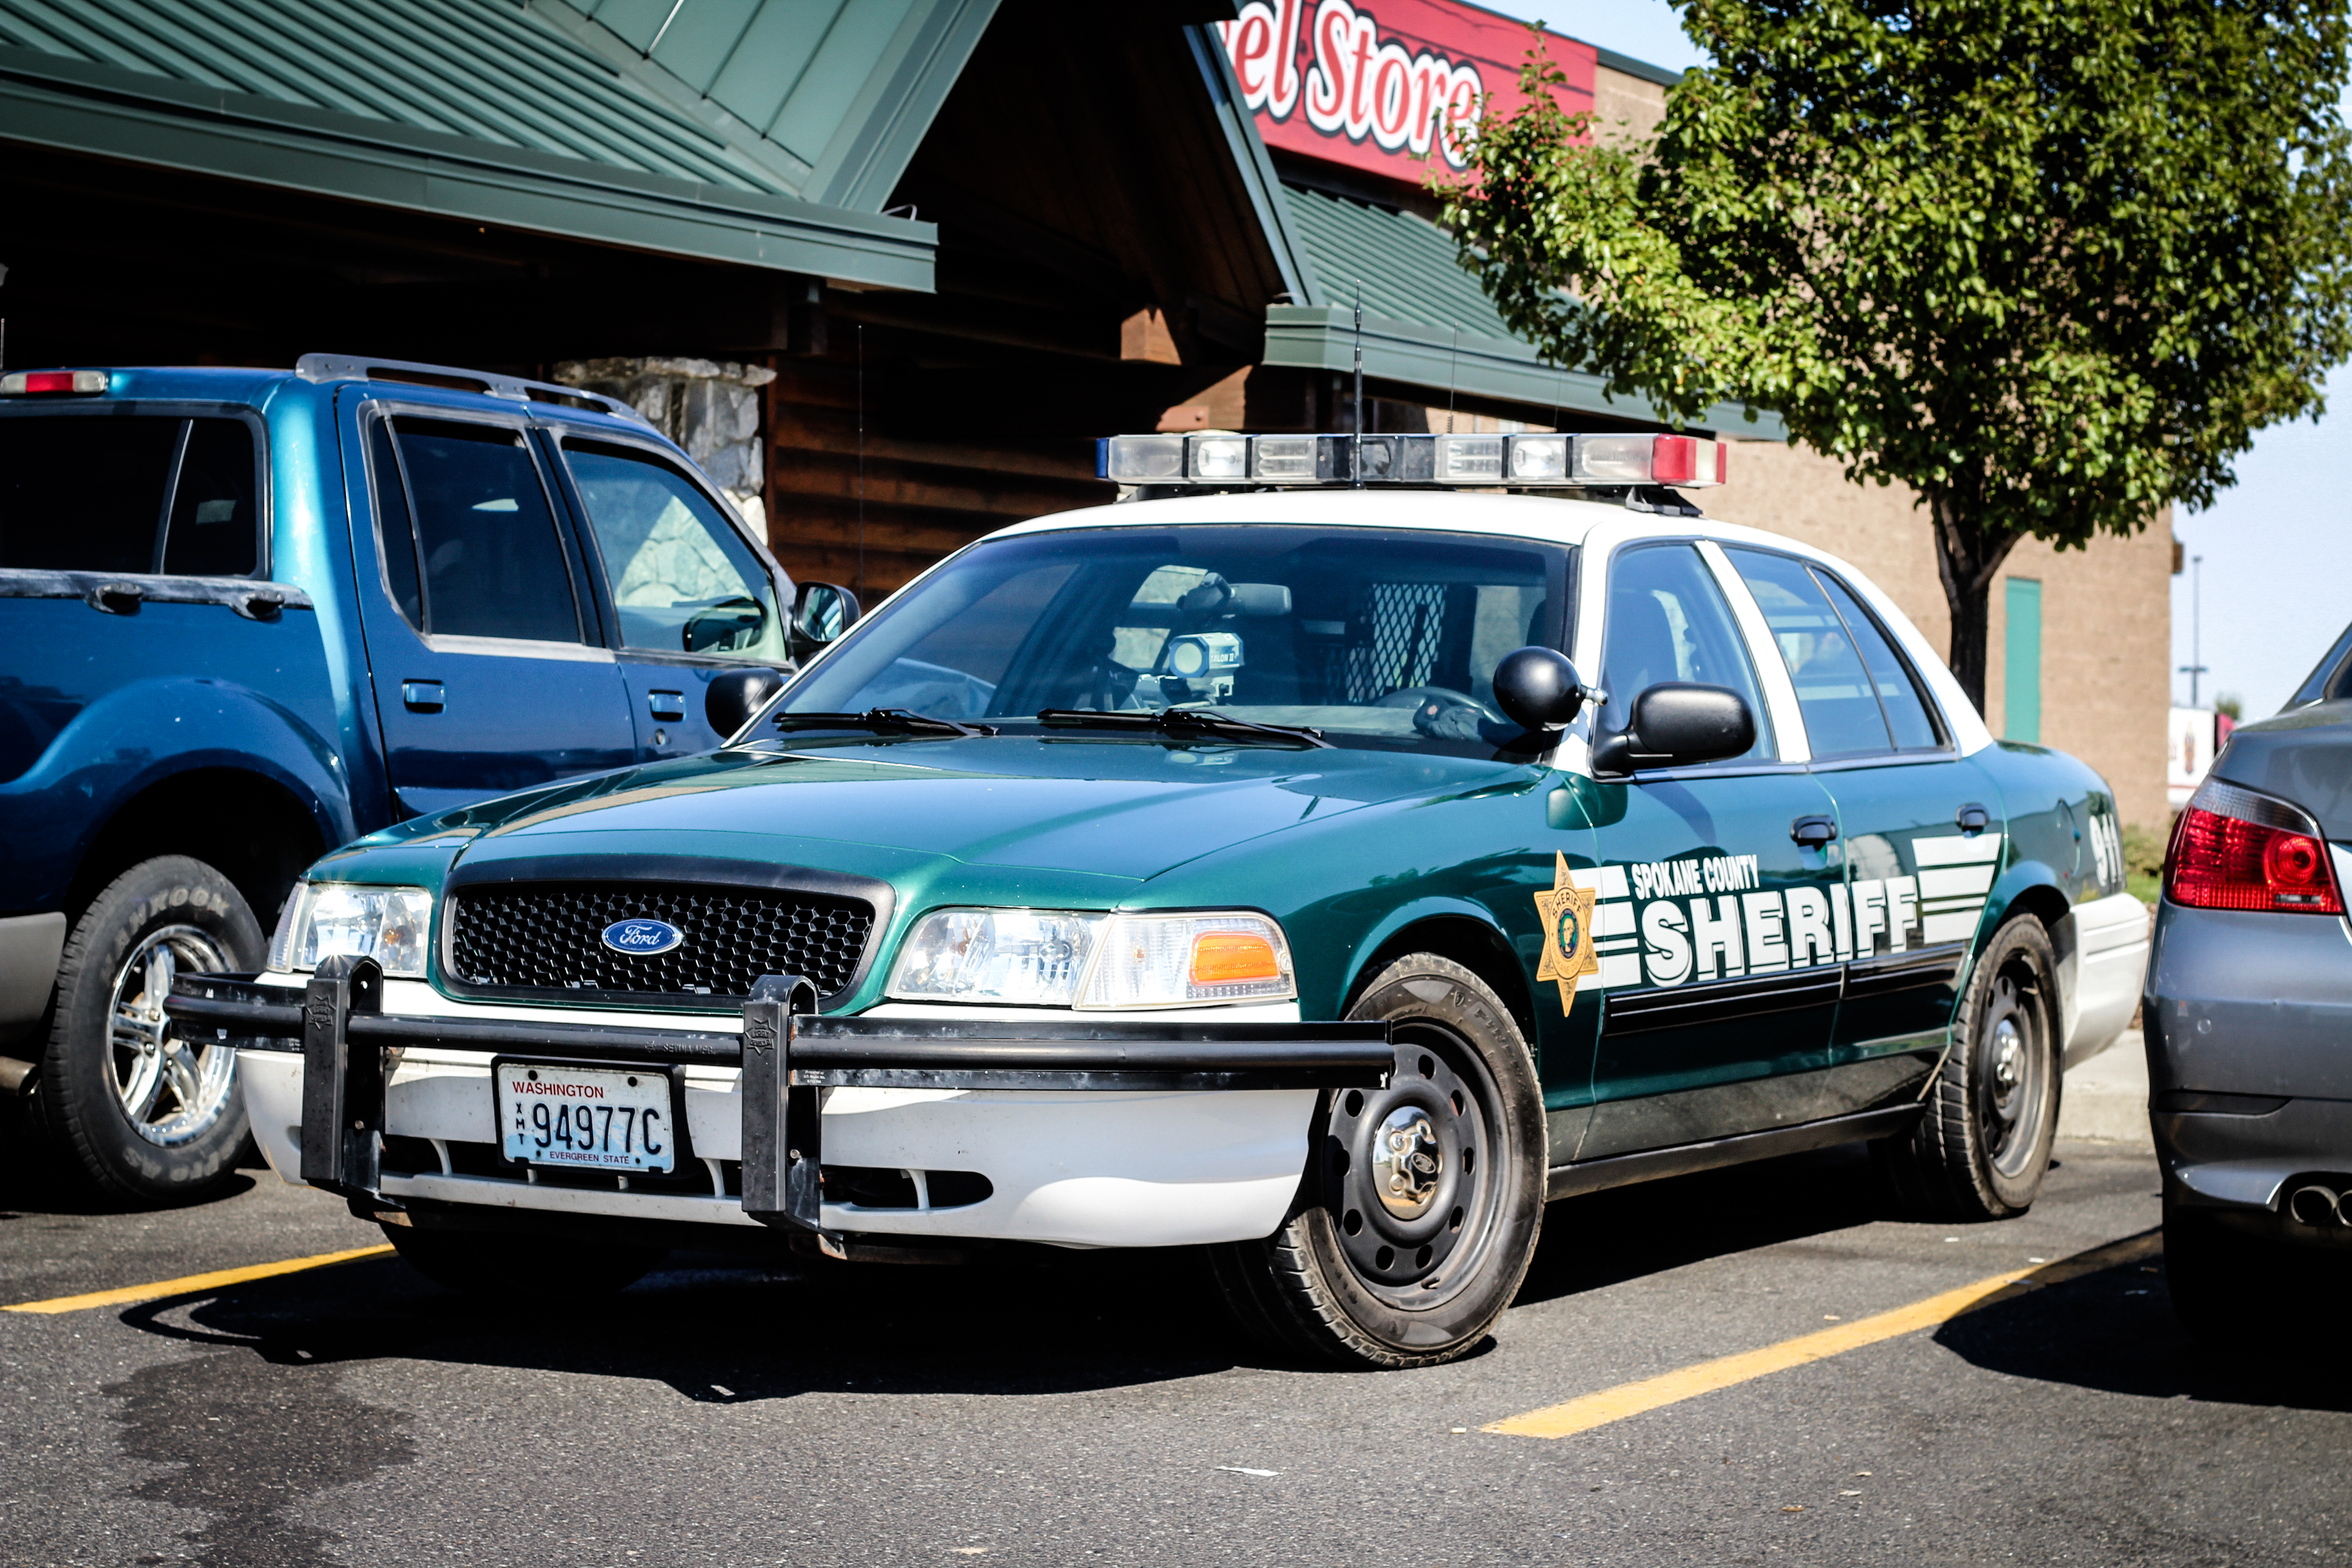 Spokane county sheriff photo